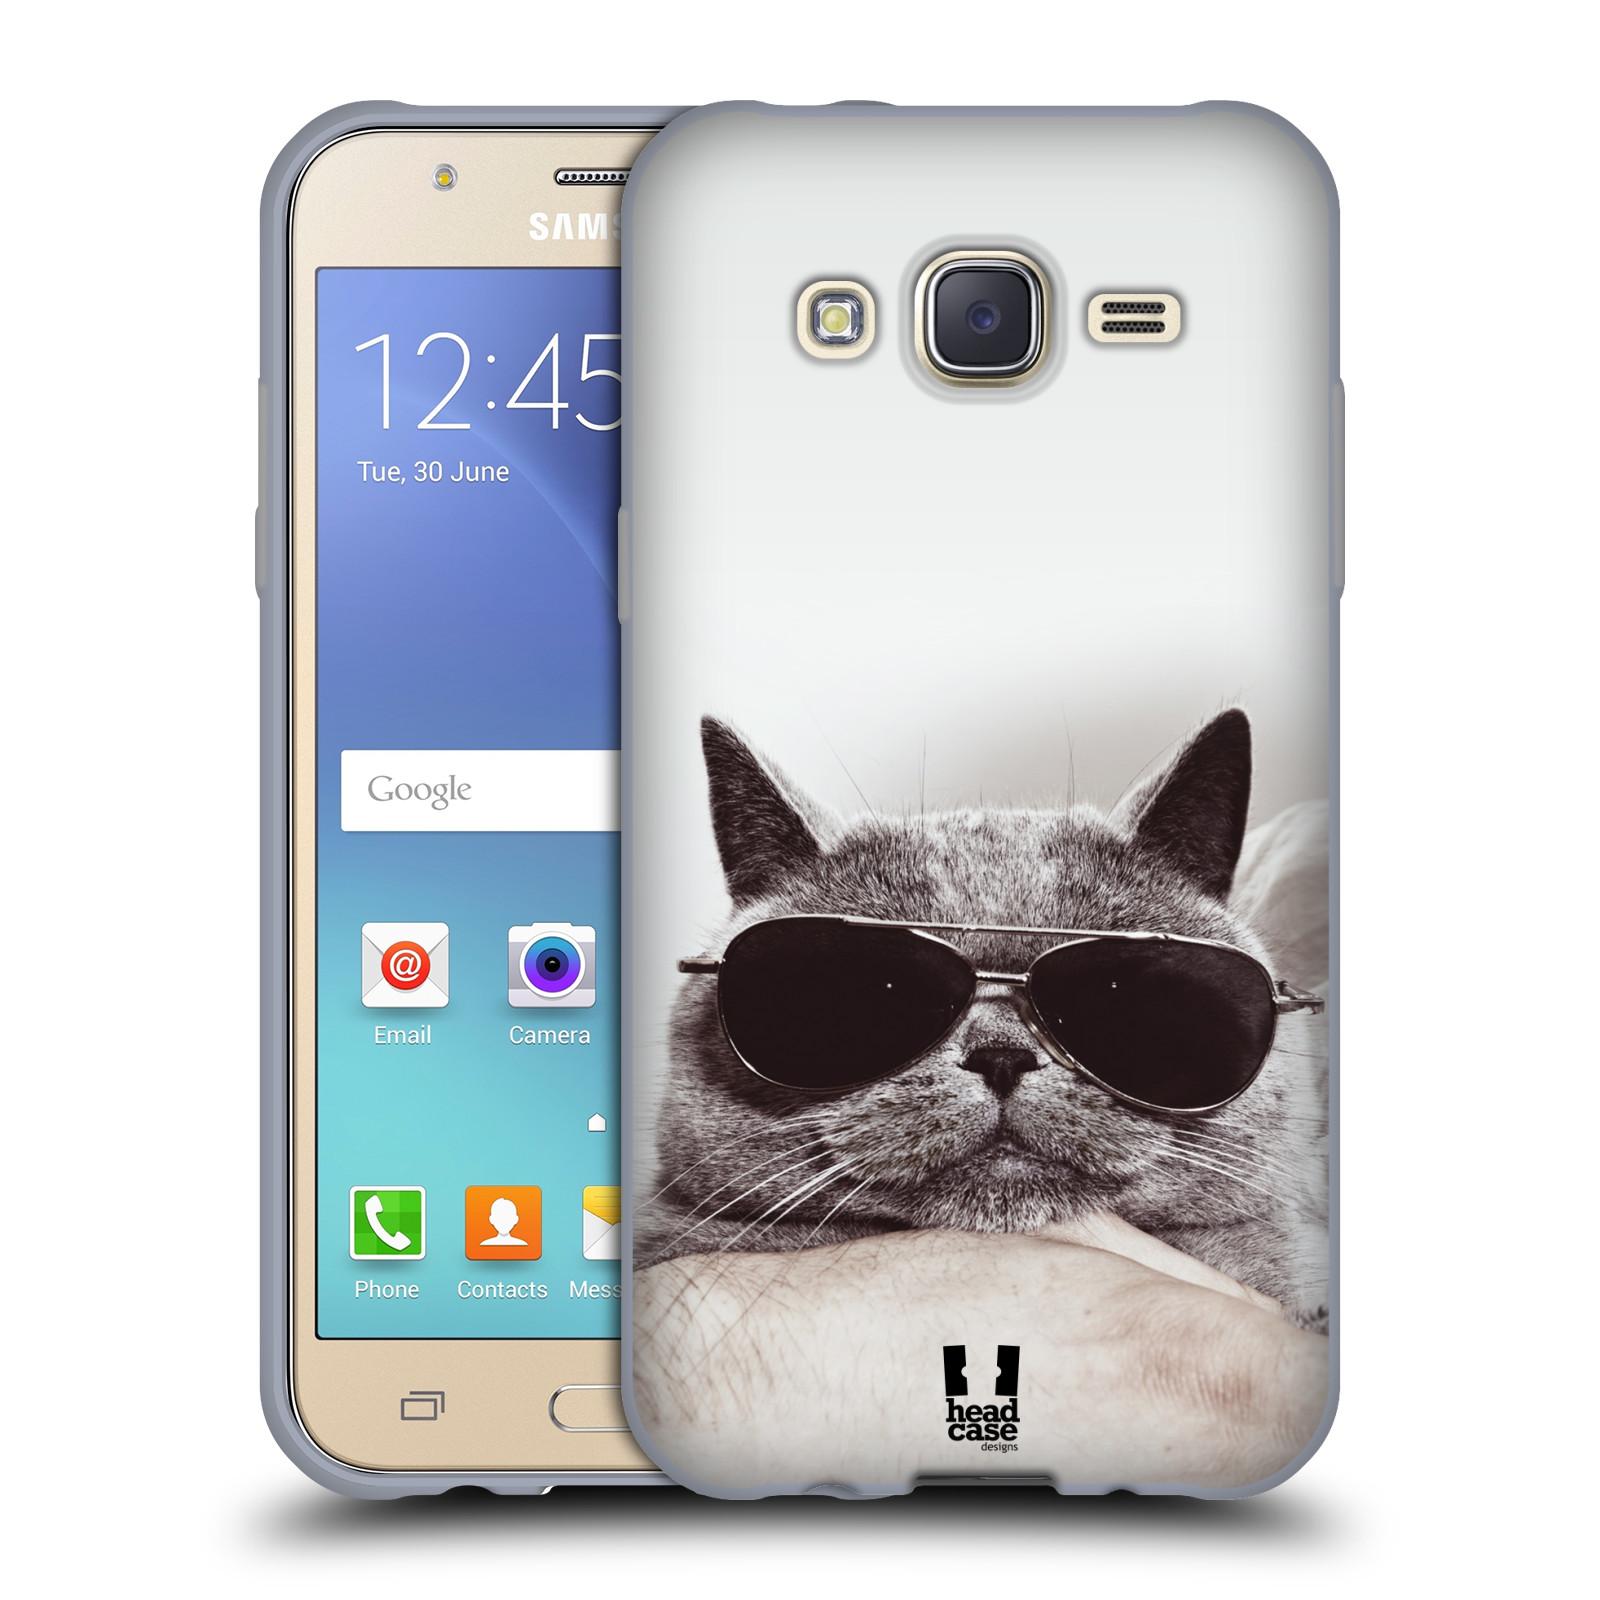 Silikonové pouzdro na mobil Samsung Galaxy J5 HEAD CASE KOTĚ S BRÝLEMI (Silikonový kryt či obal na mobilní telefon Samsung Galaxy Samsung Galaxy J5 SM-J500)